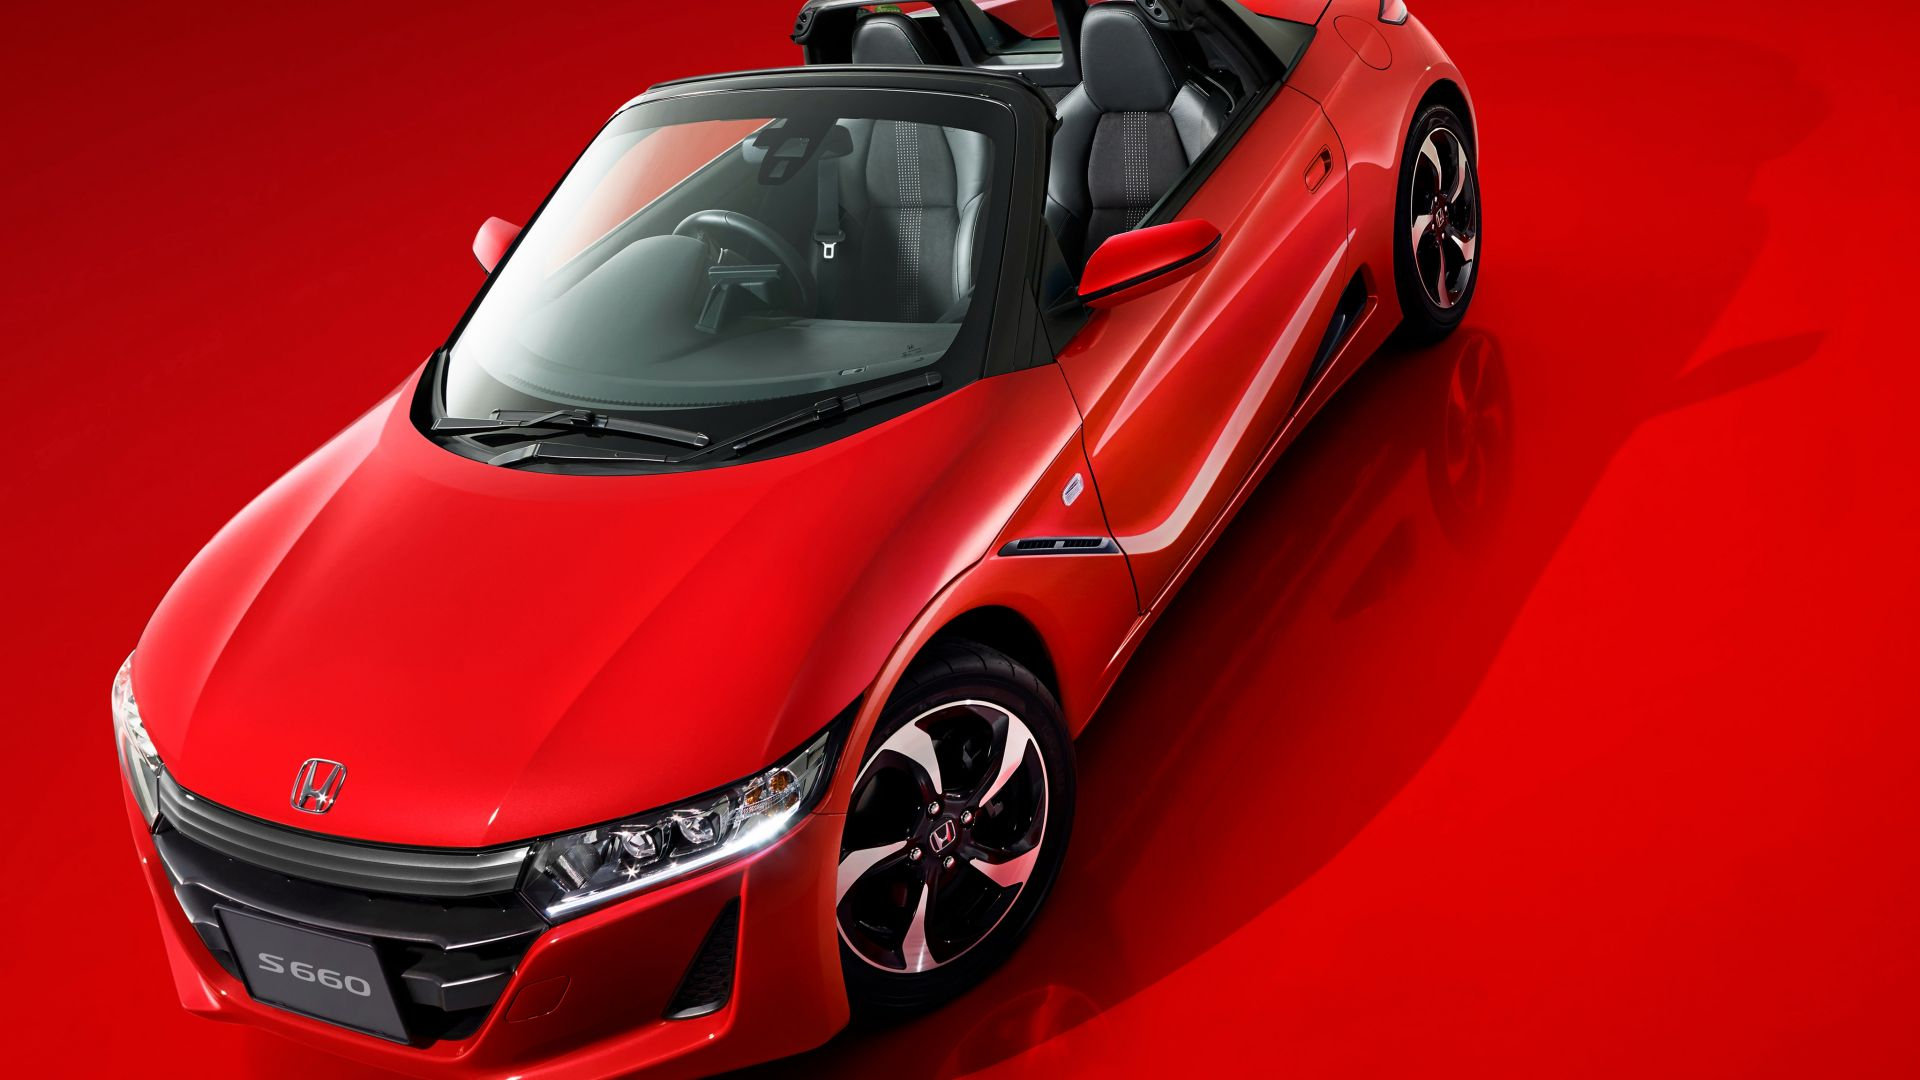 Wallpaper honda s660 concept red future car tokyo for Future honda cars